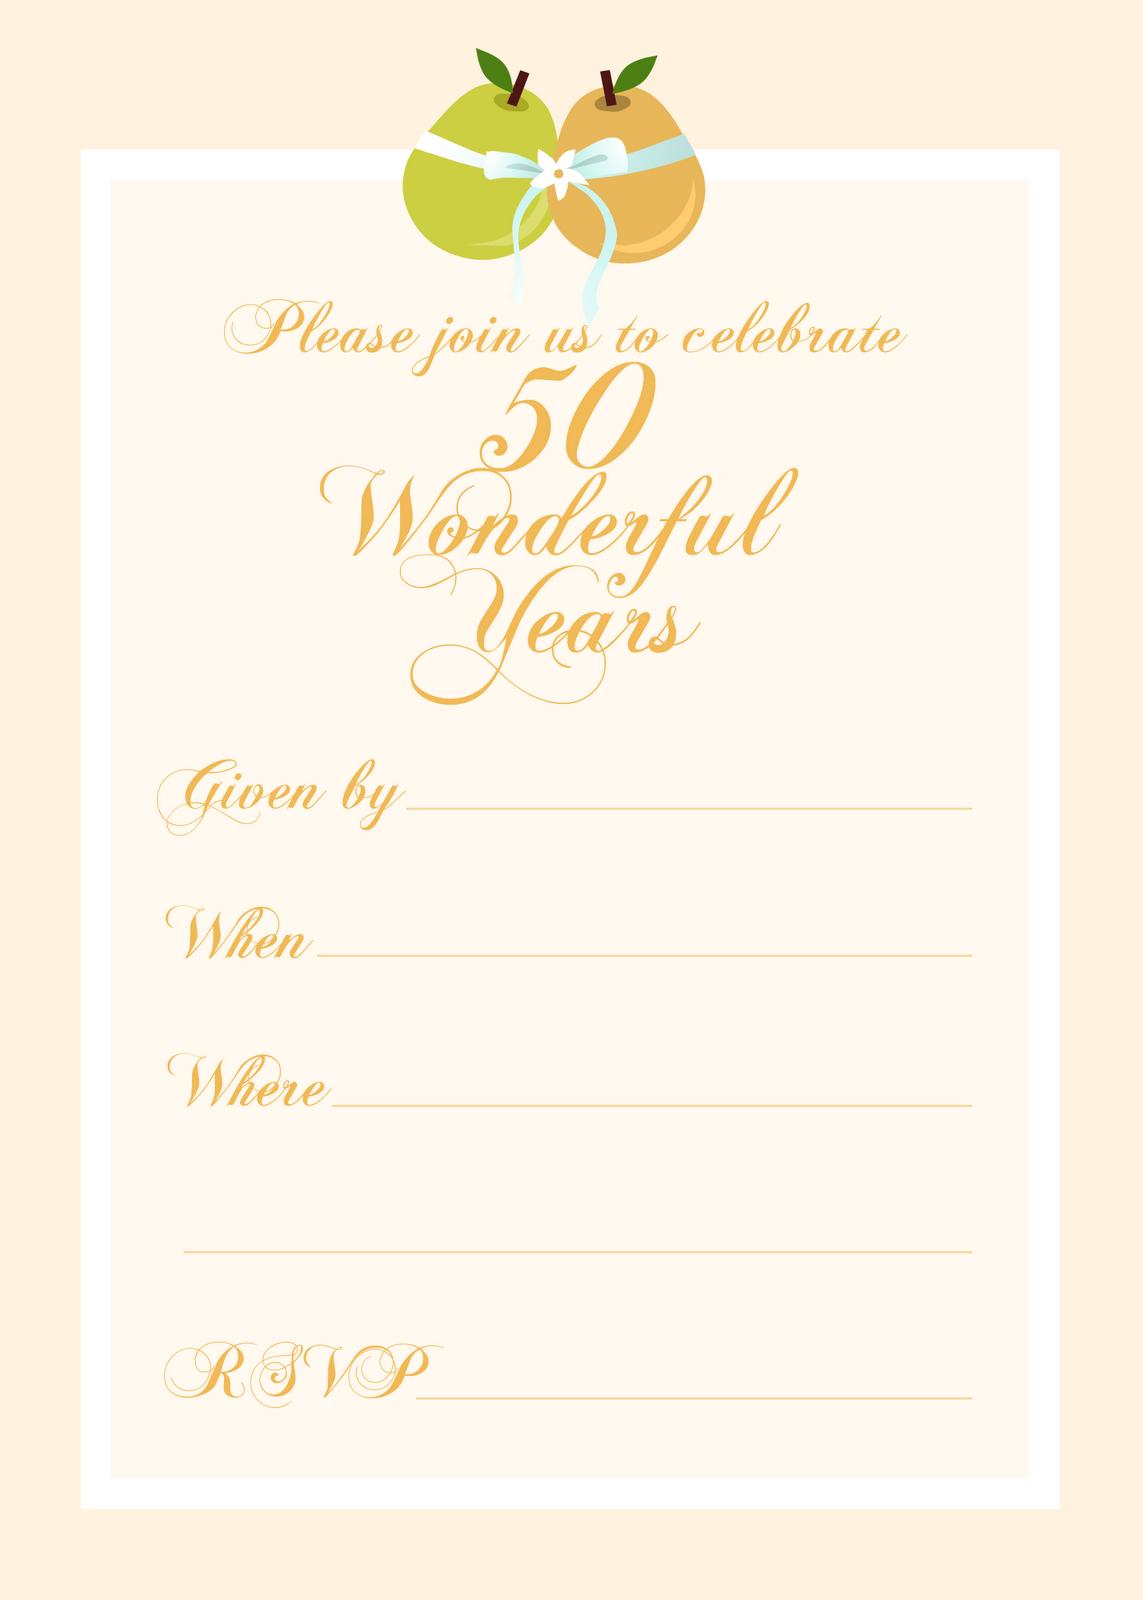 Free Printable Wedding Anniversary Invitation Templates